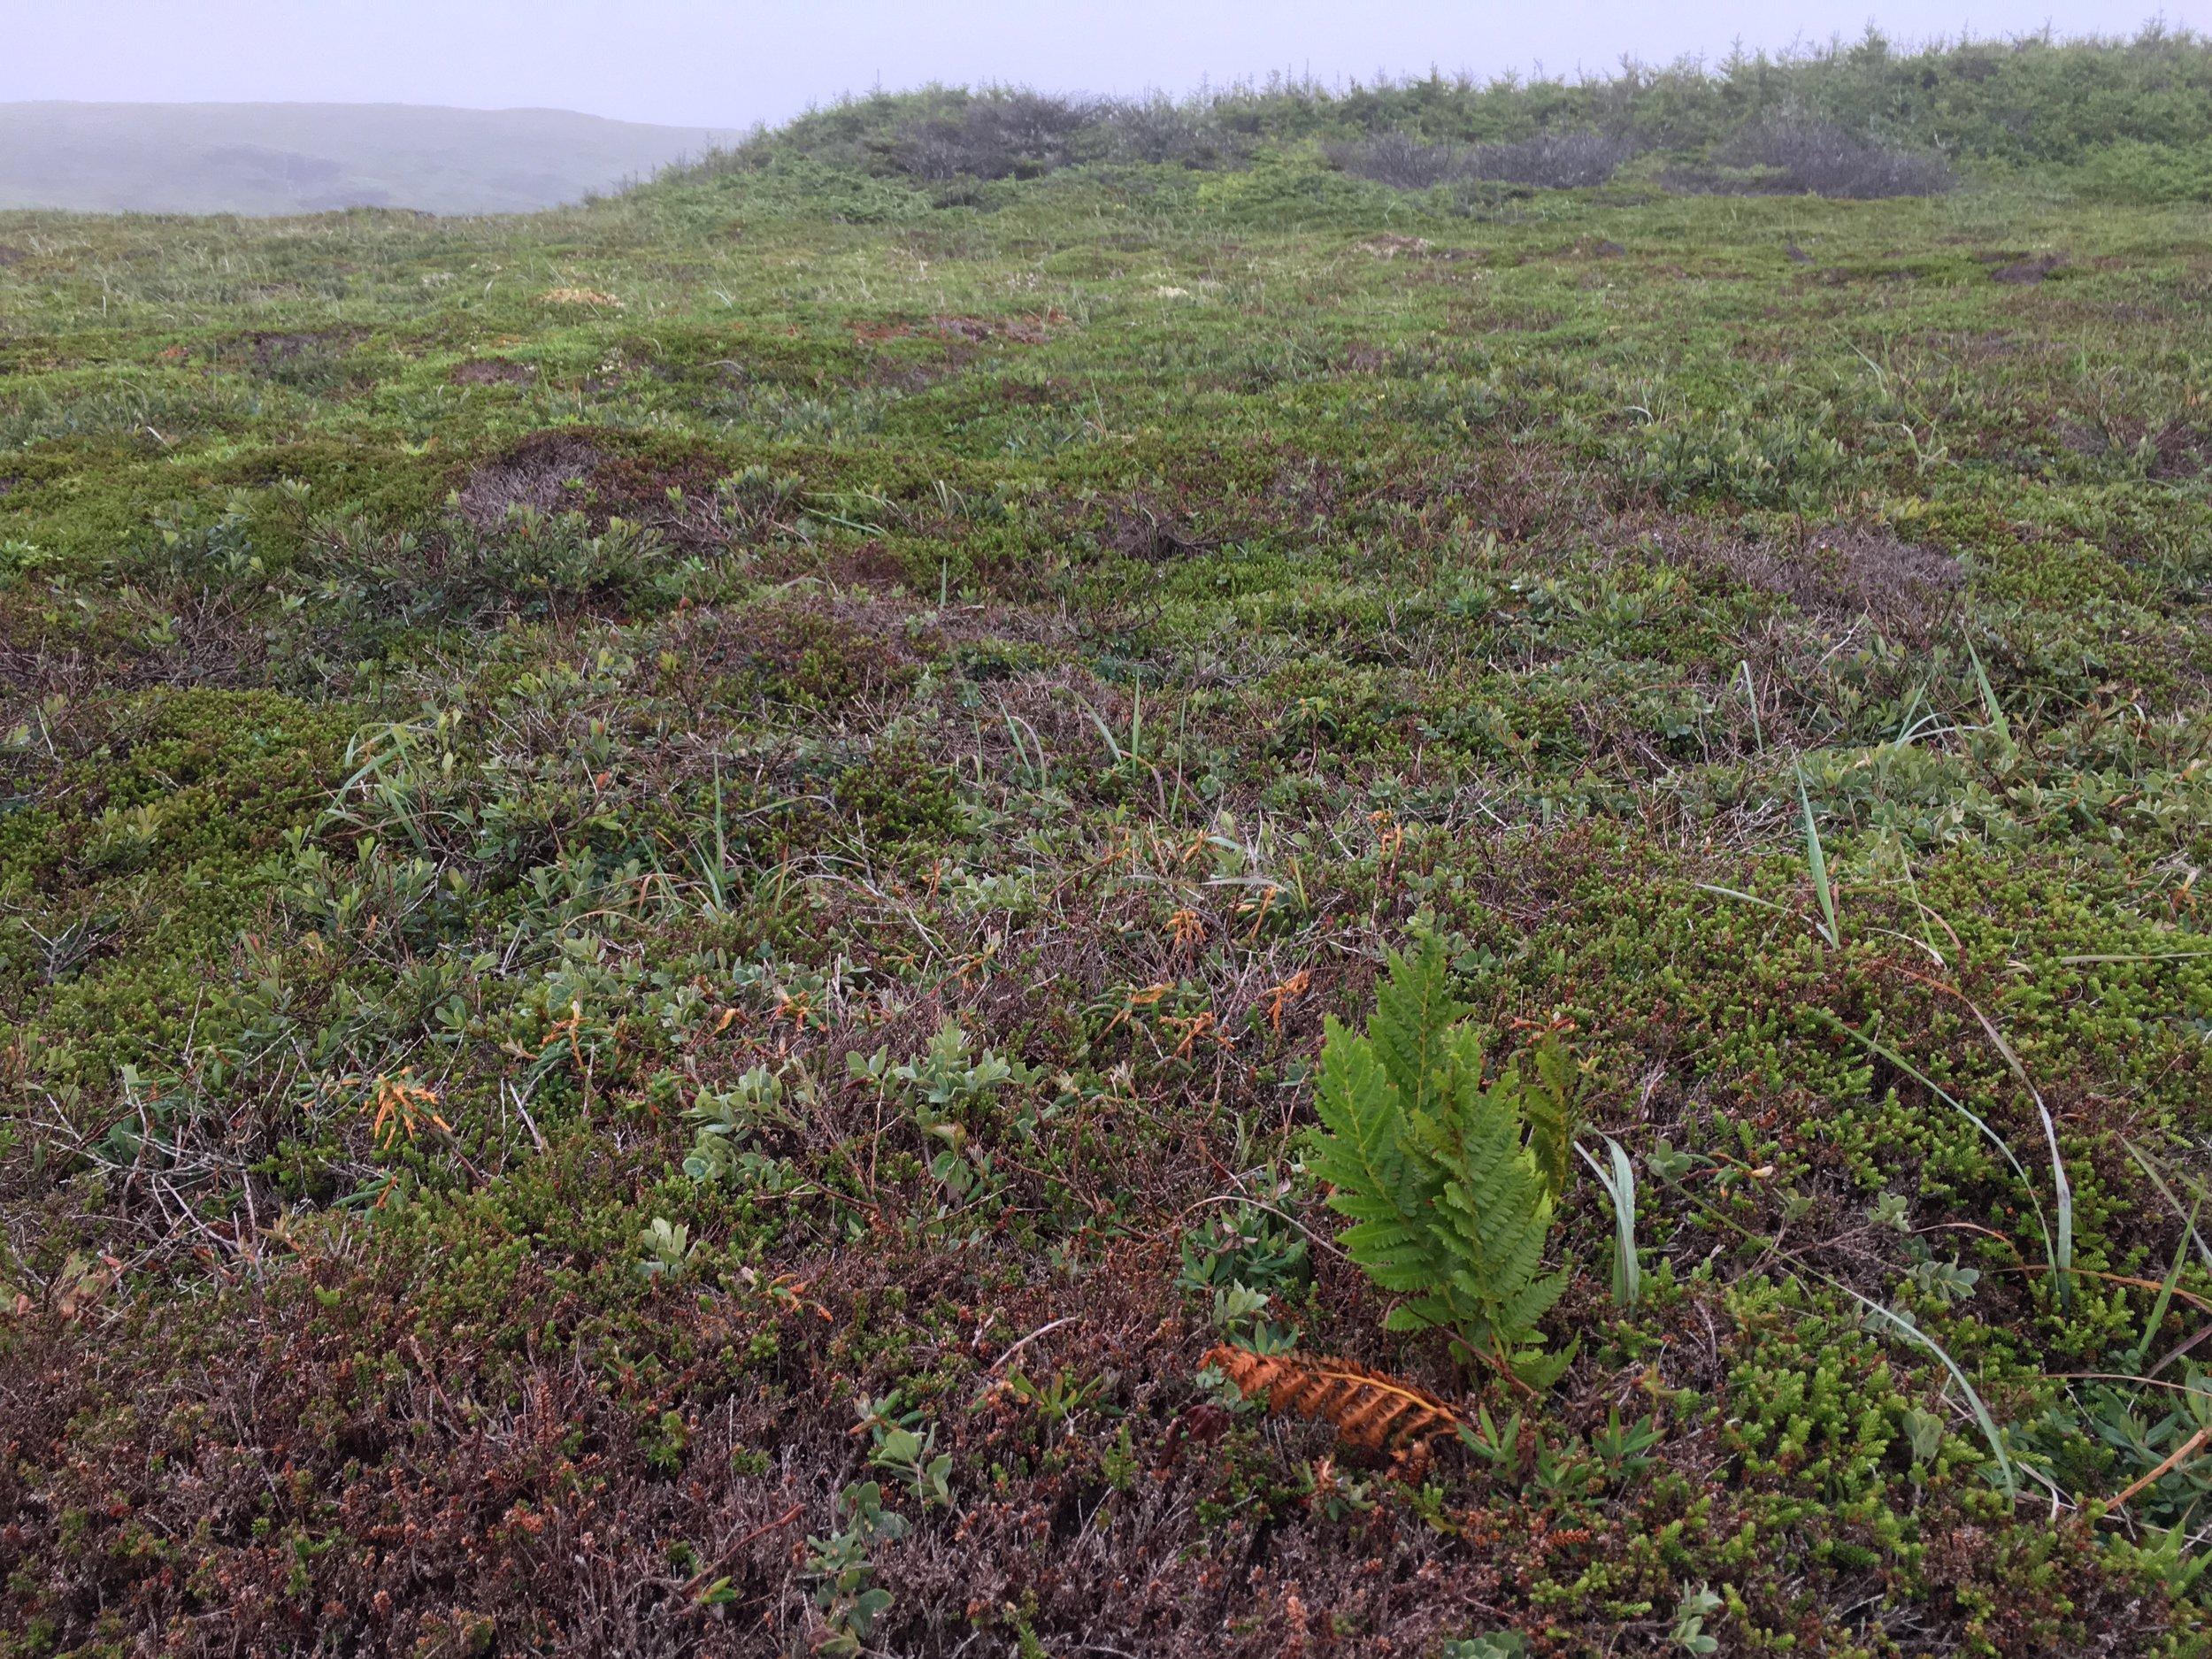 Habitat for alpine azalea at Mistaken Point Ecological Reserve.